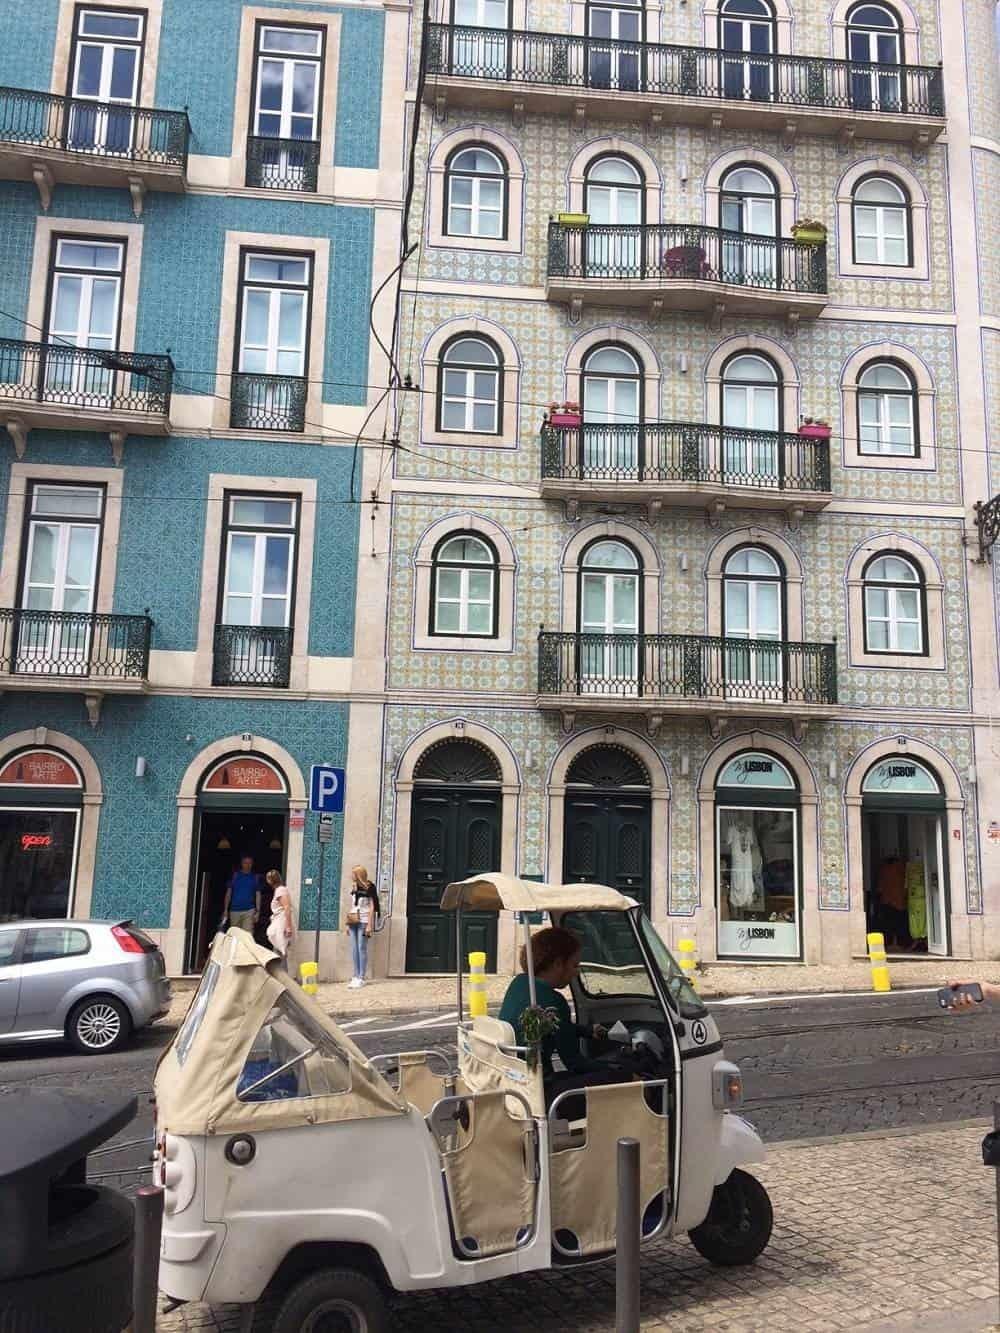 Tuk-tuk in Lisbon